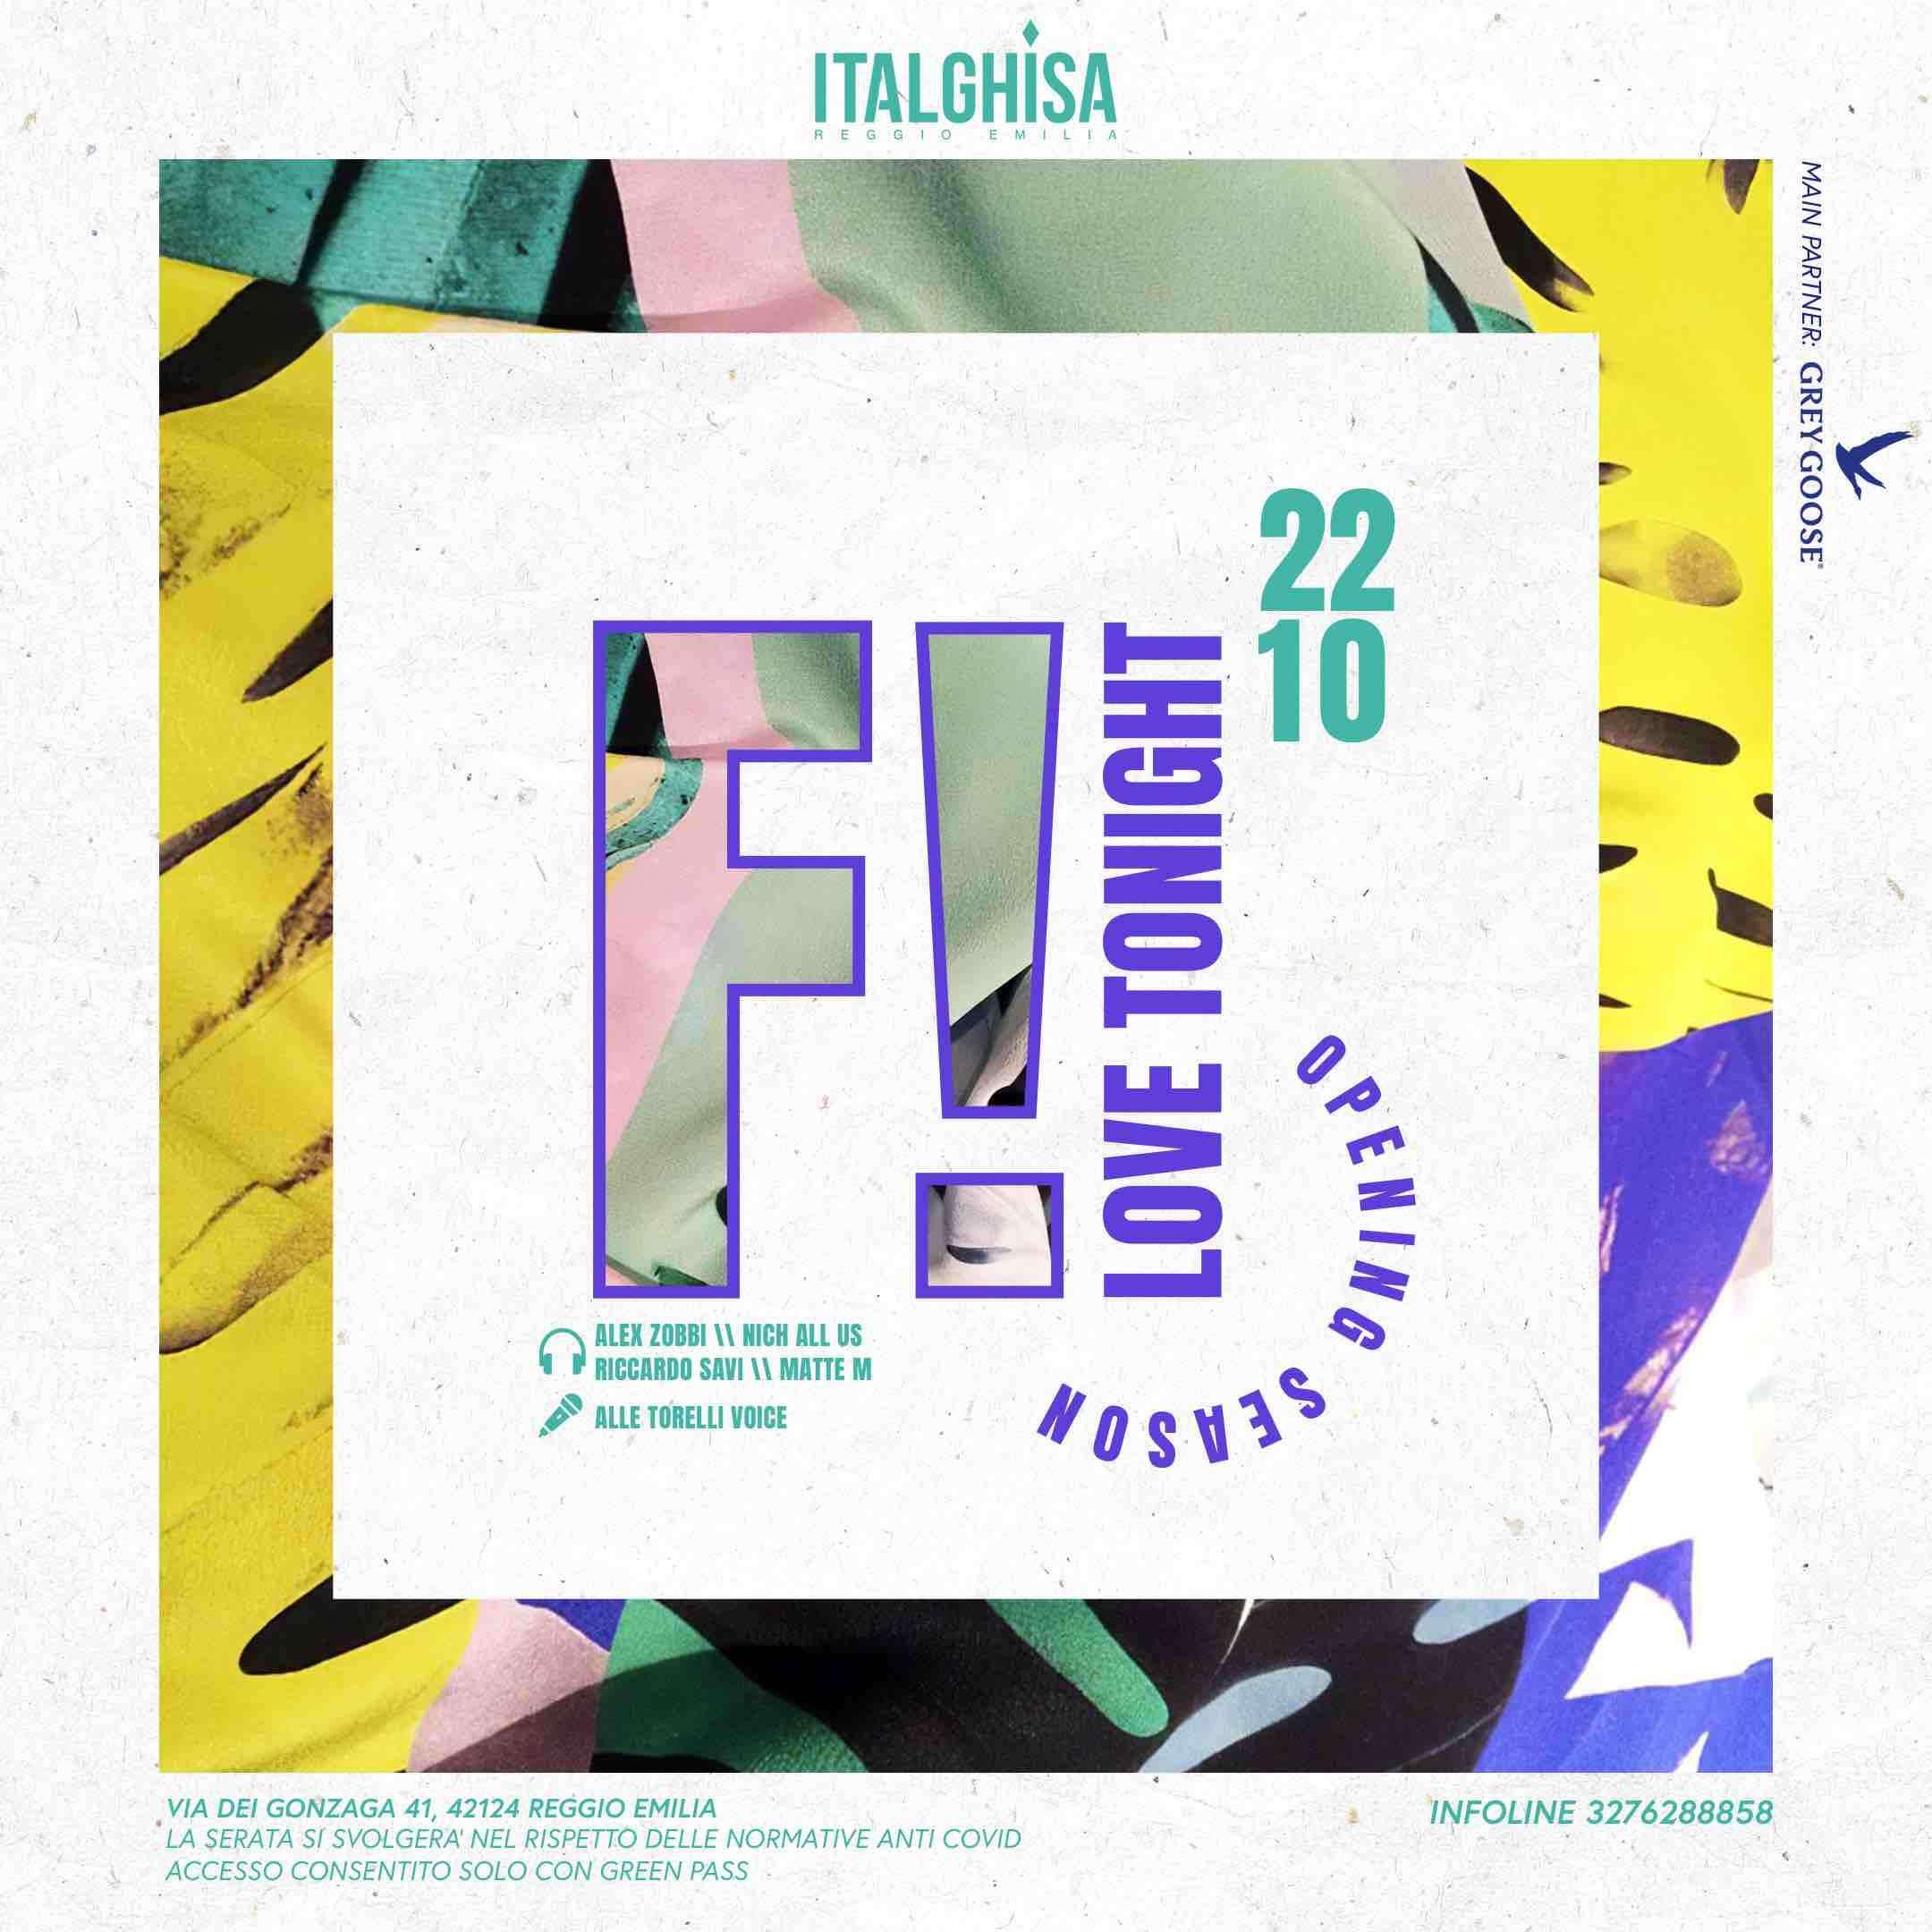 F! - Friday Italghisa // Opening Season // 22.10.21  ITALGHISA / RE